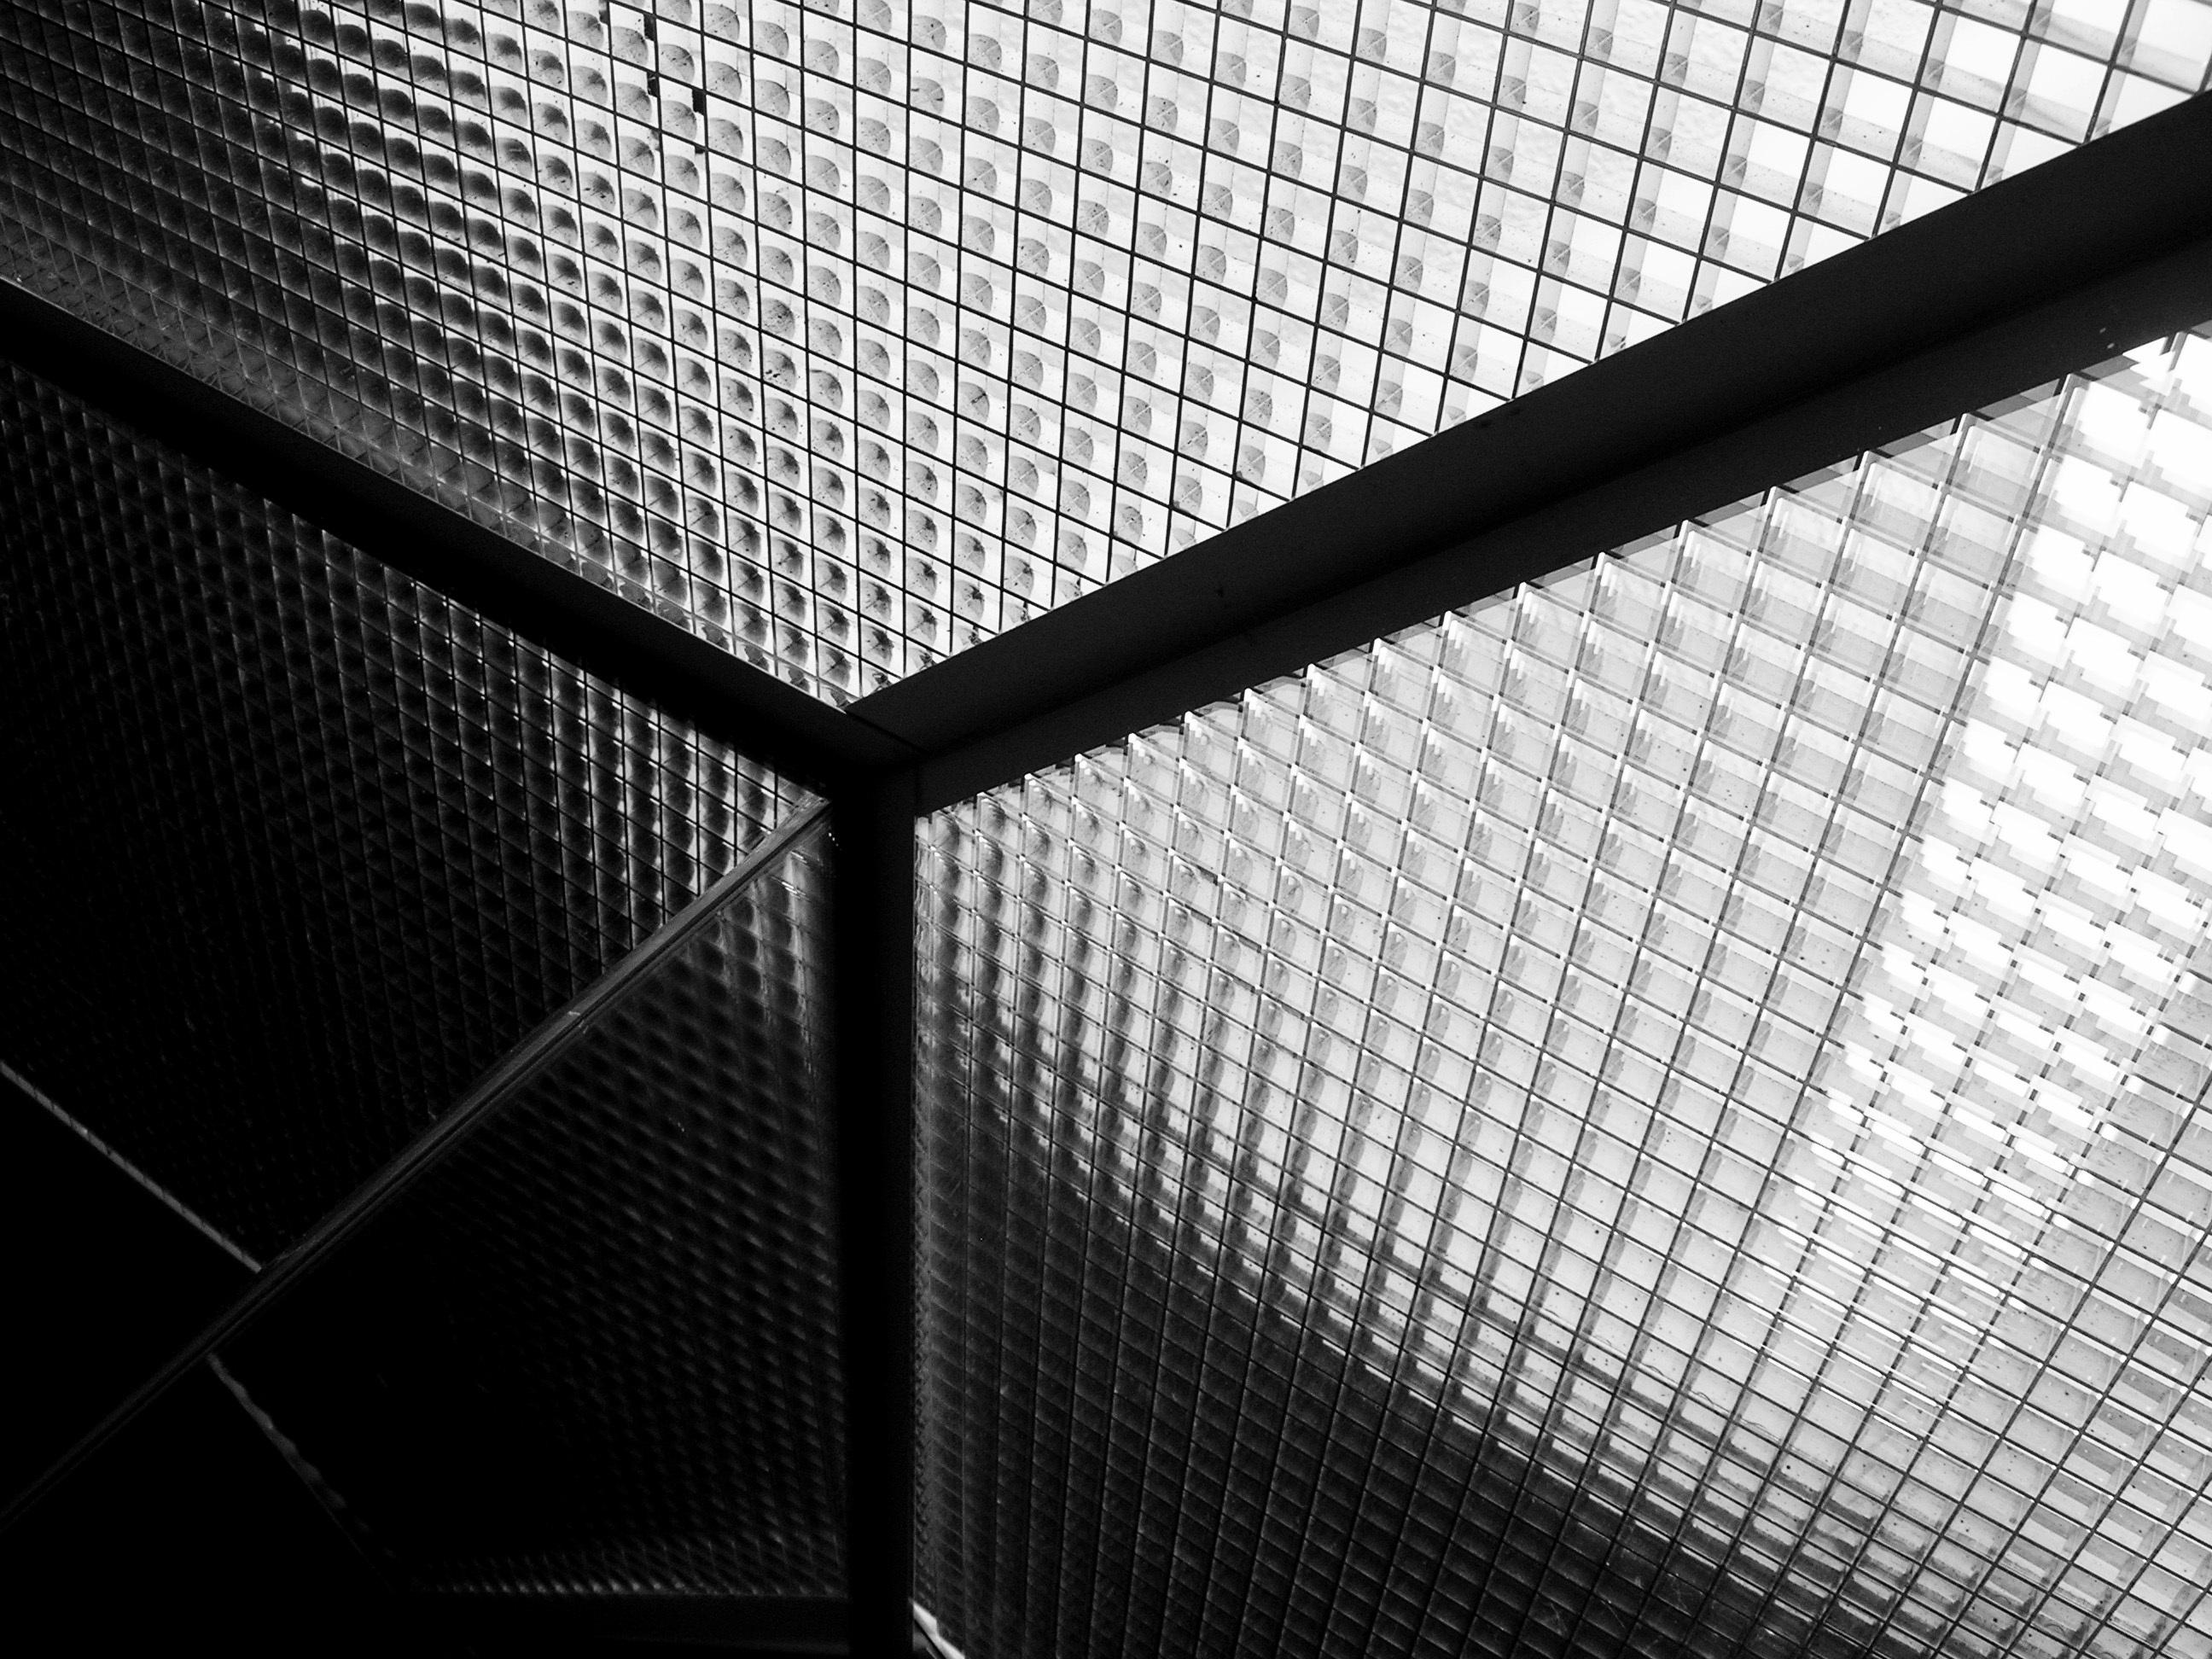 Gambar Cahaya Abstrak Hitam Dan Putih Perspektif Pola Garis